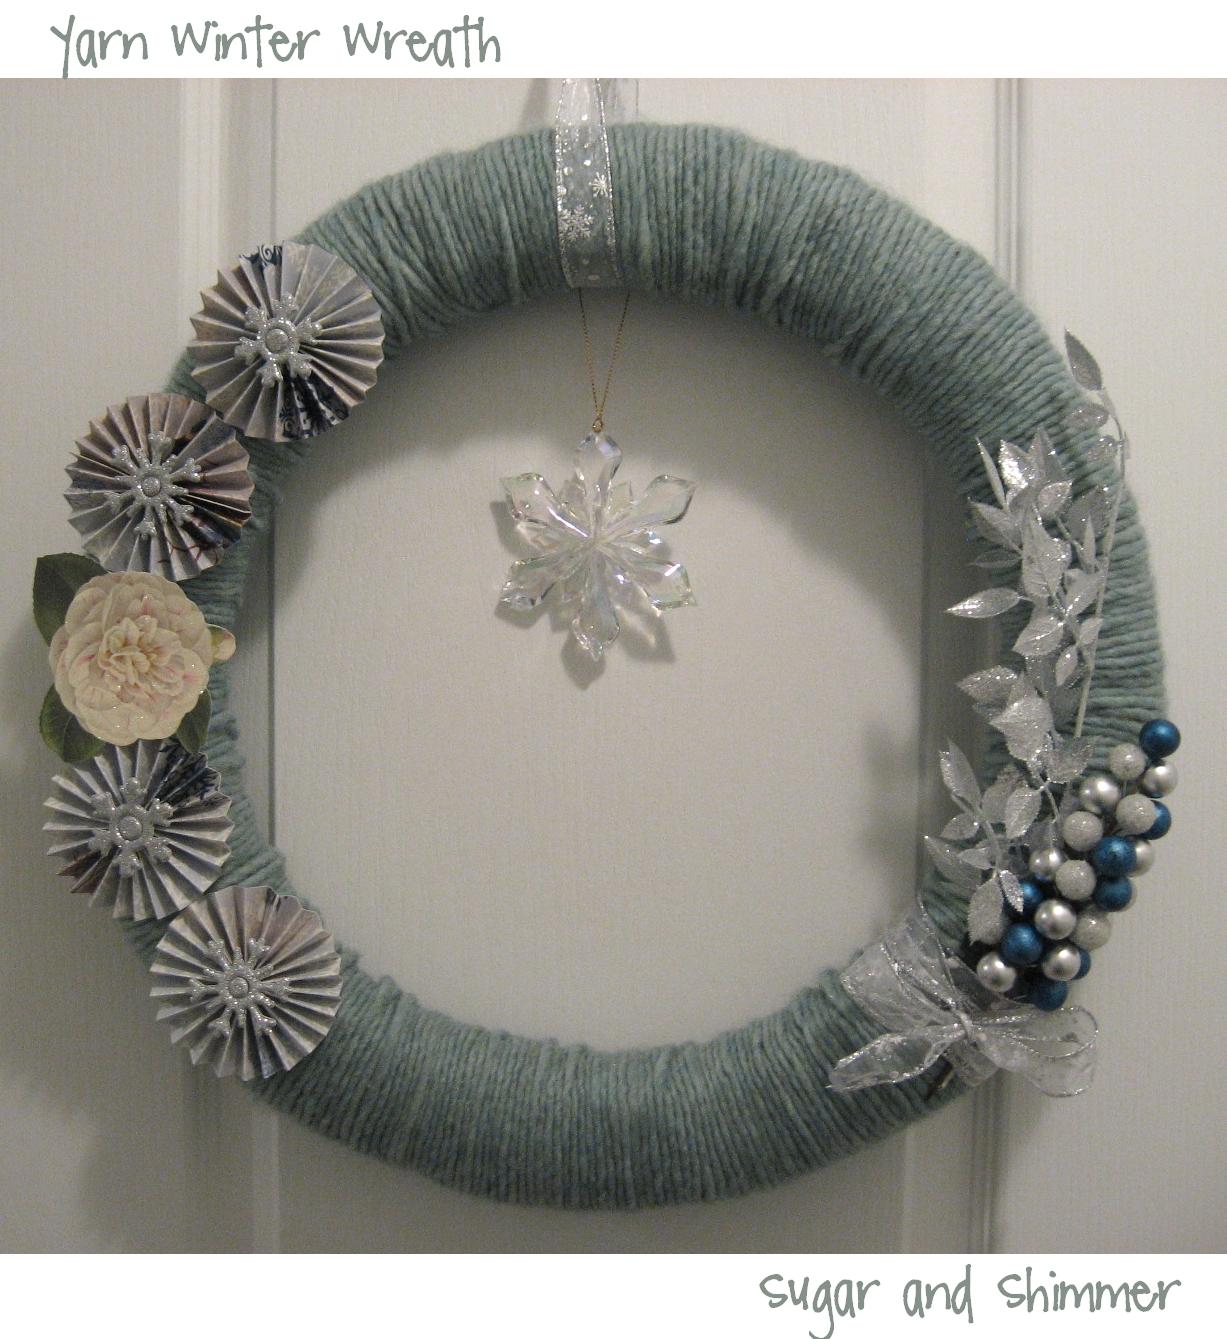 Sugar and Shimmer: Yarn Winter Wreath